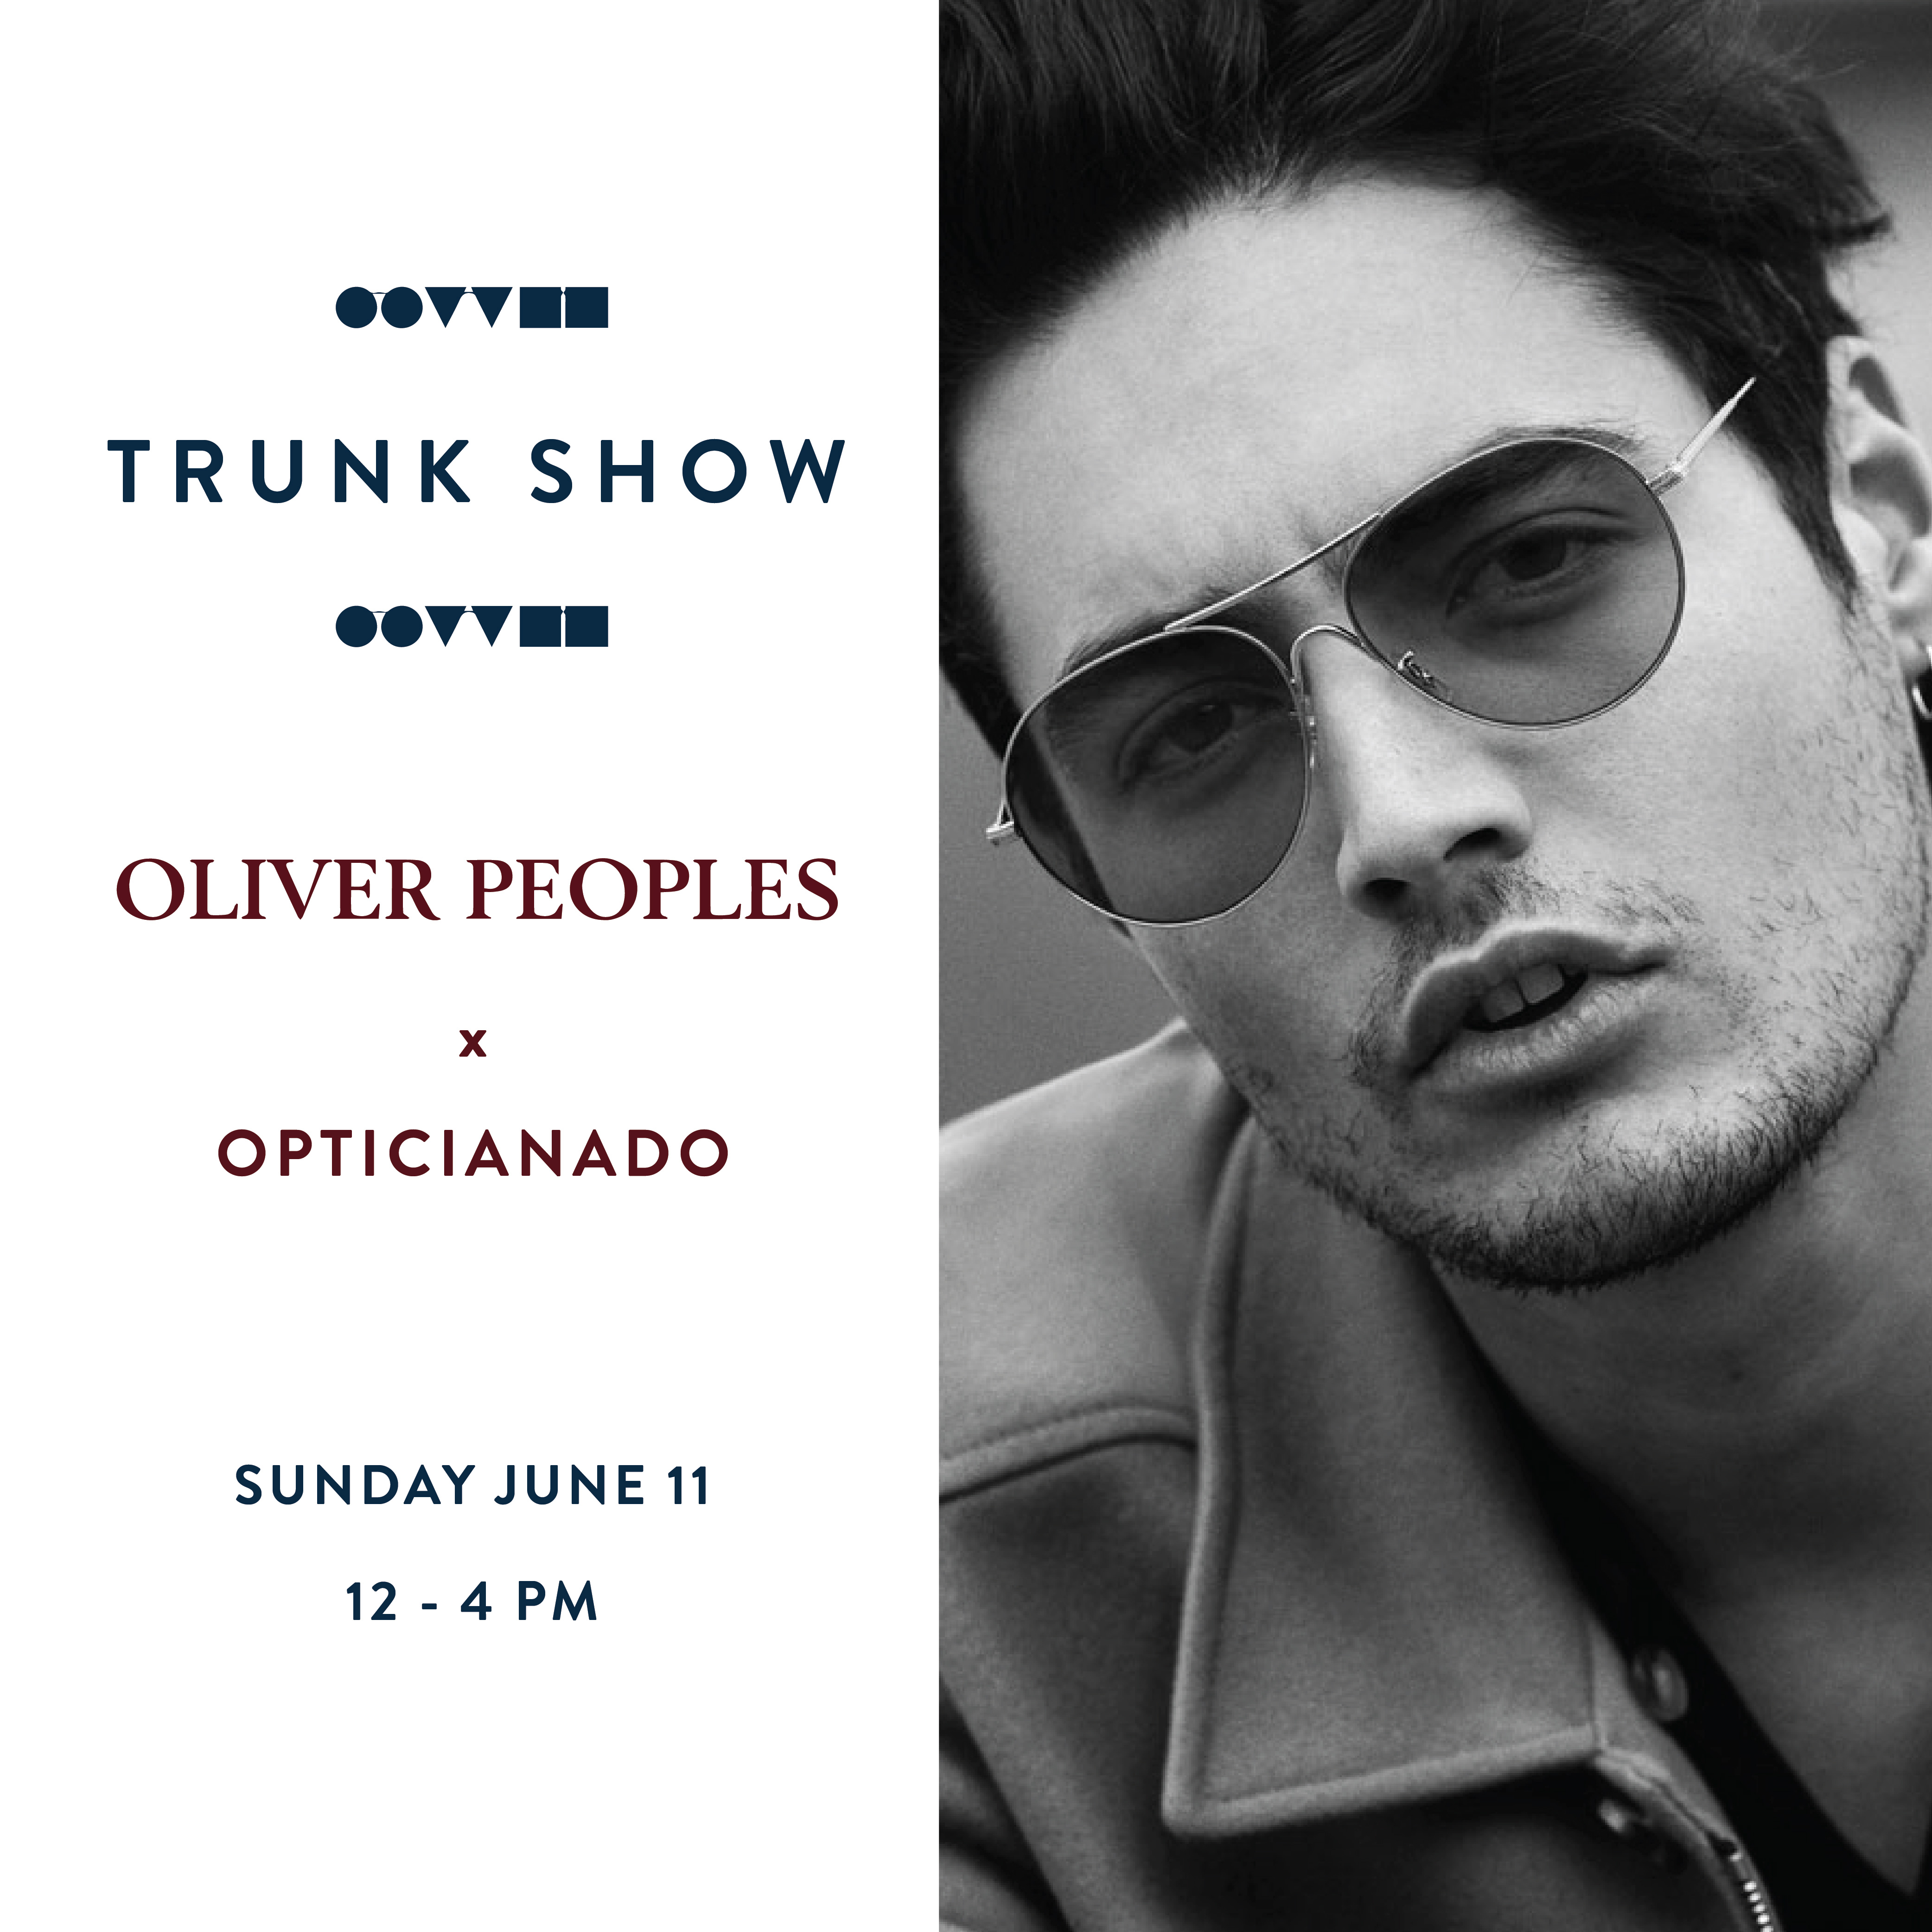 OP X OPTICIANADO TRUNK SHOW 01 3